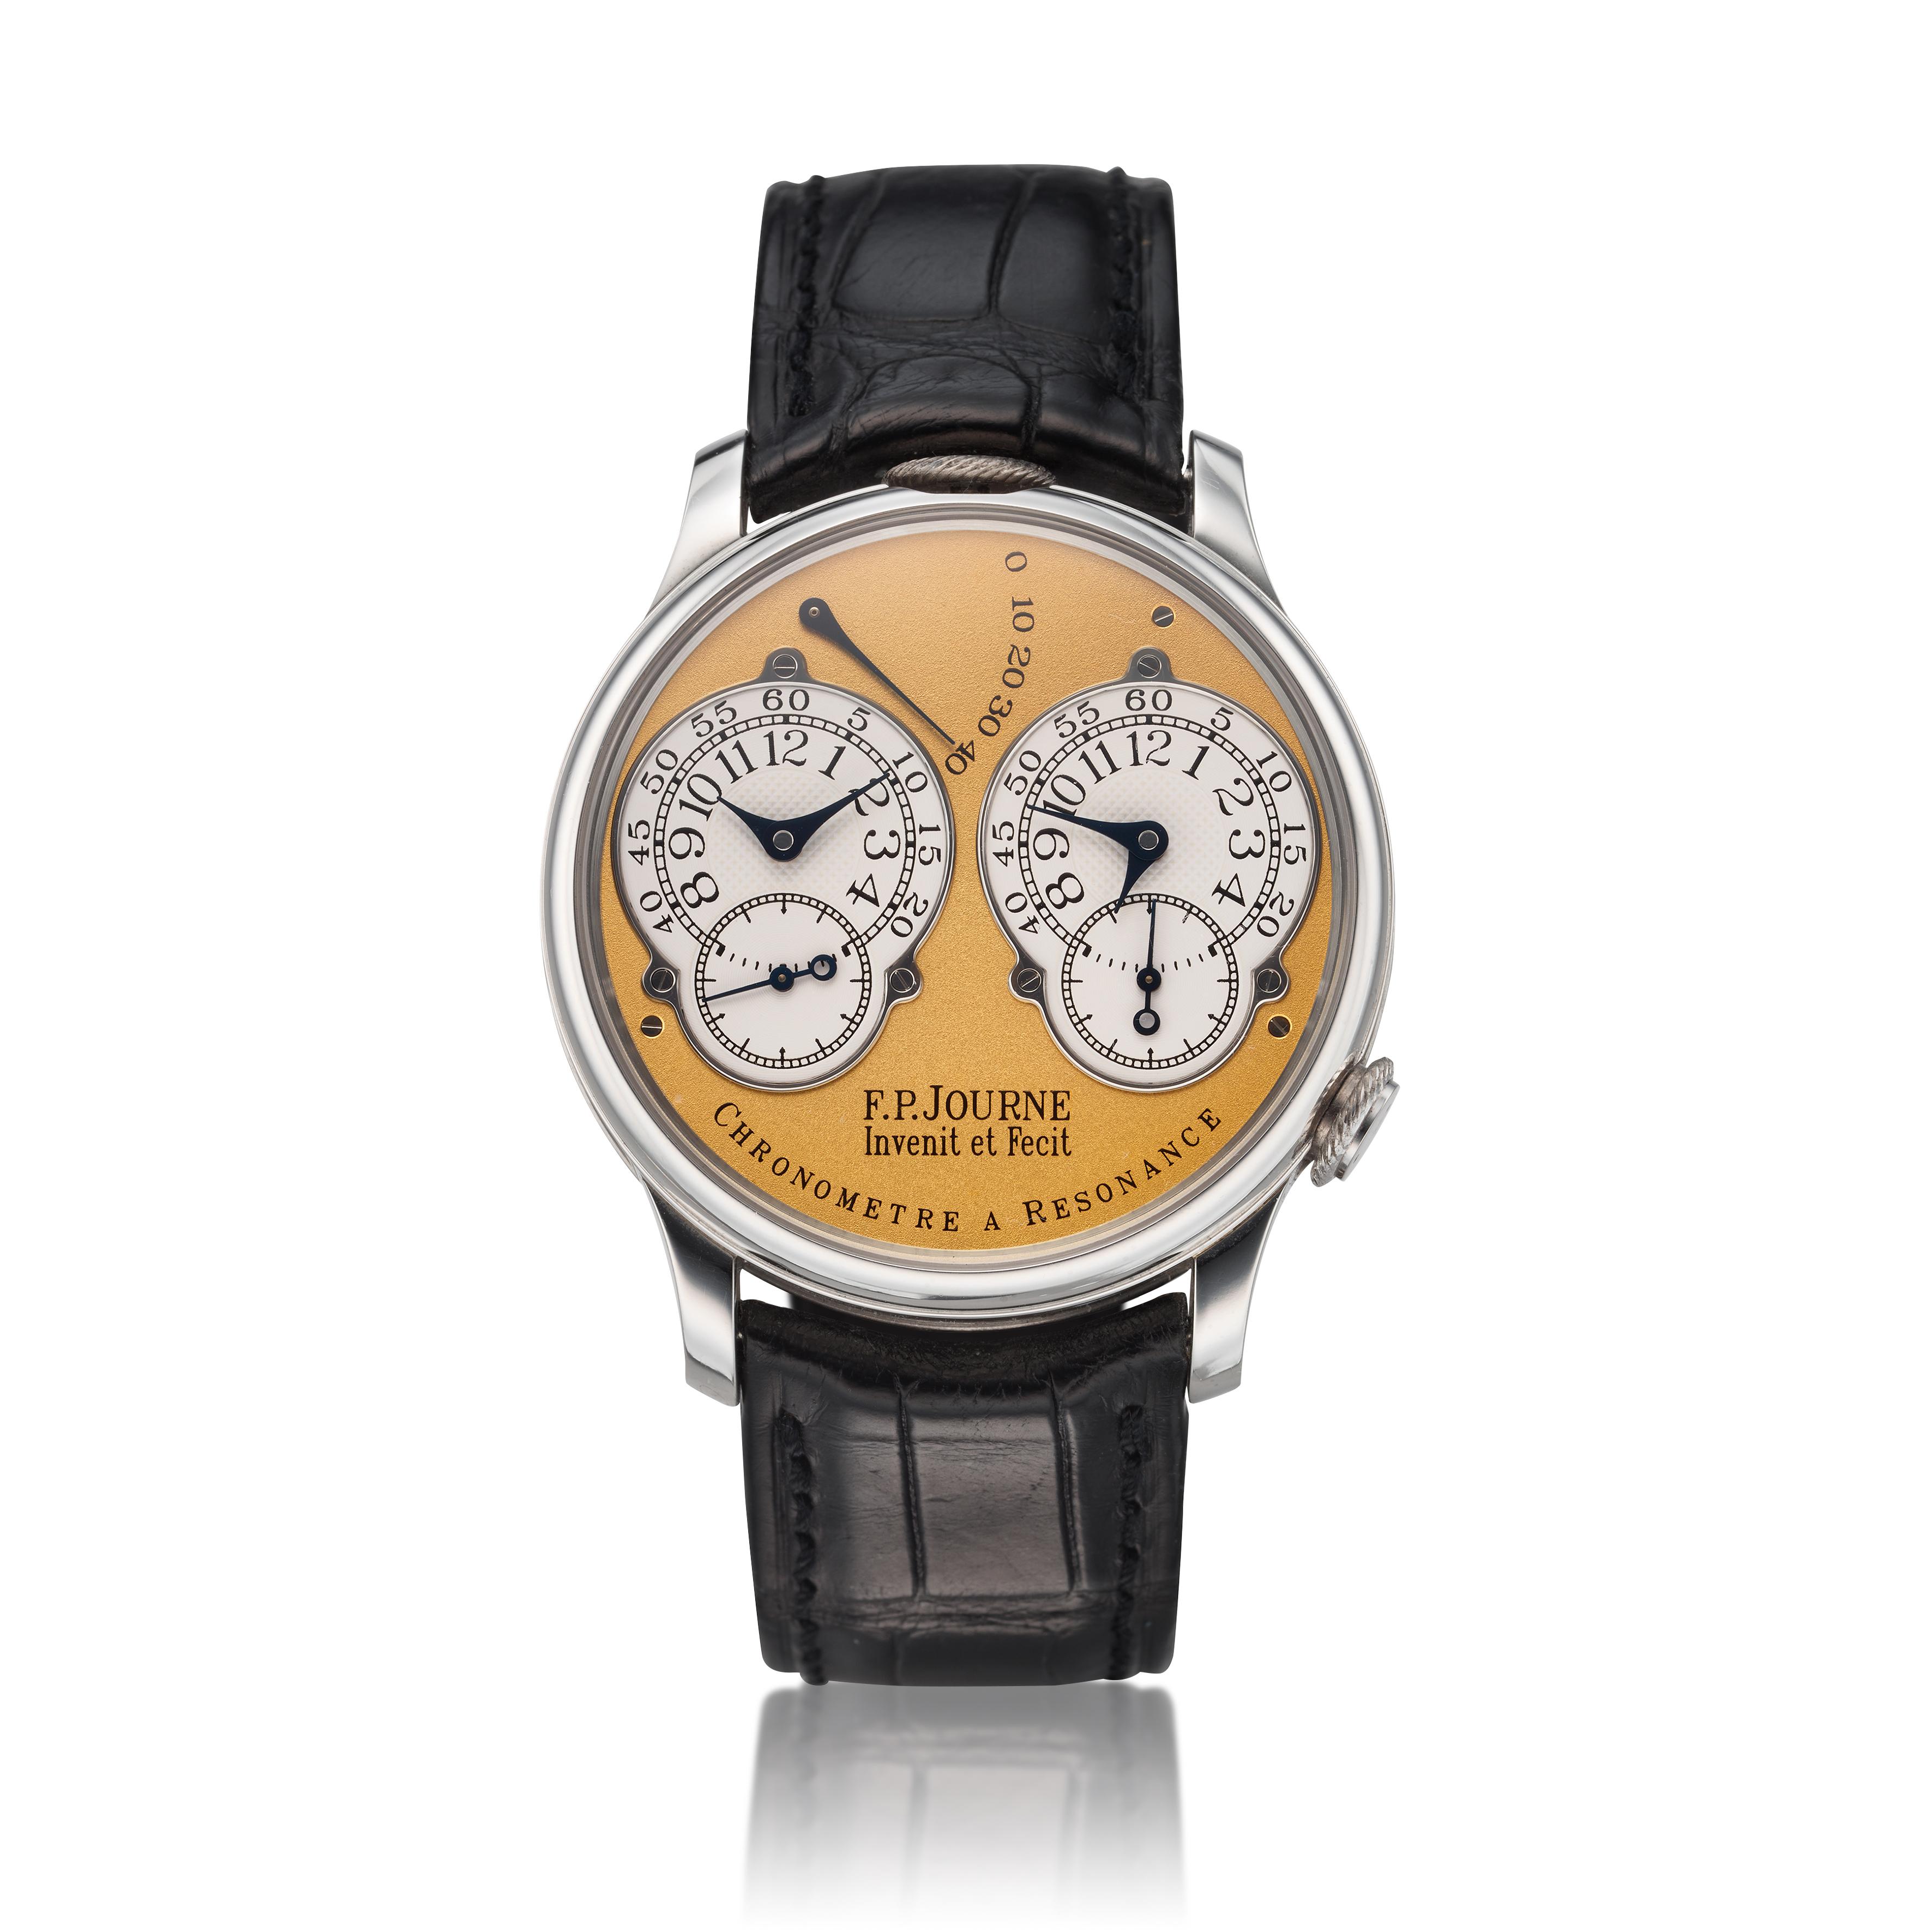 View full screen - View 1 of Lot 422. Chronomètre à Résonance  A platinum dual time wristwatch with power reserve indication and brass movement, Circa 2002 .